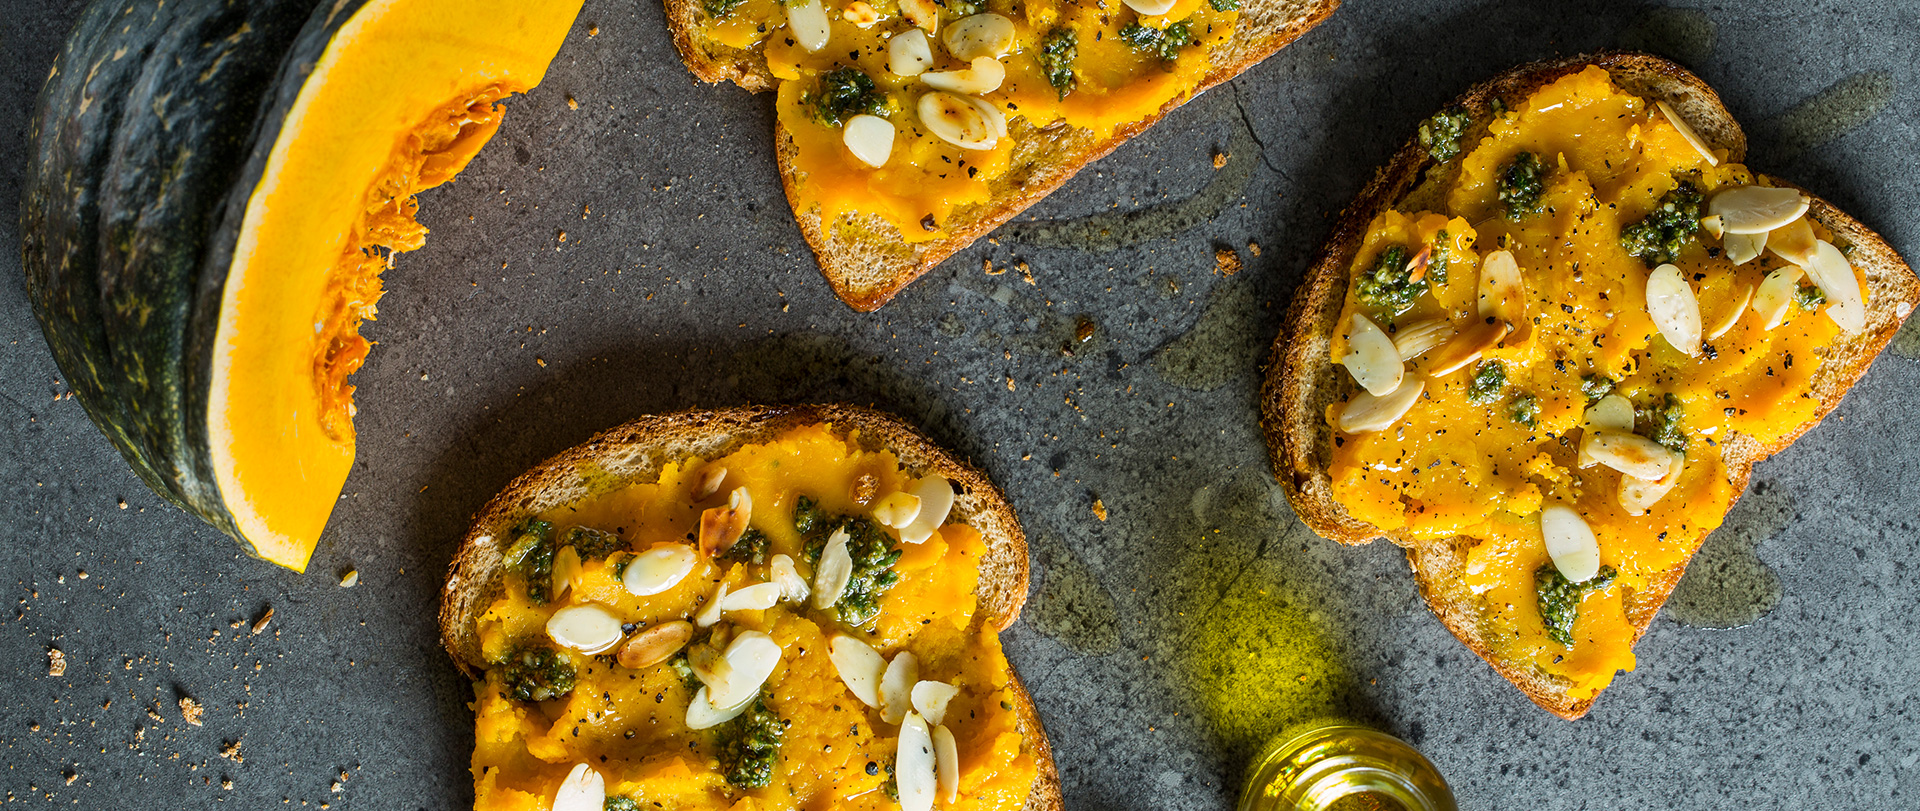 Sanduíche aberto com pasta de moranga, pesto e amêndoas